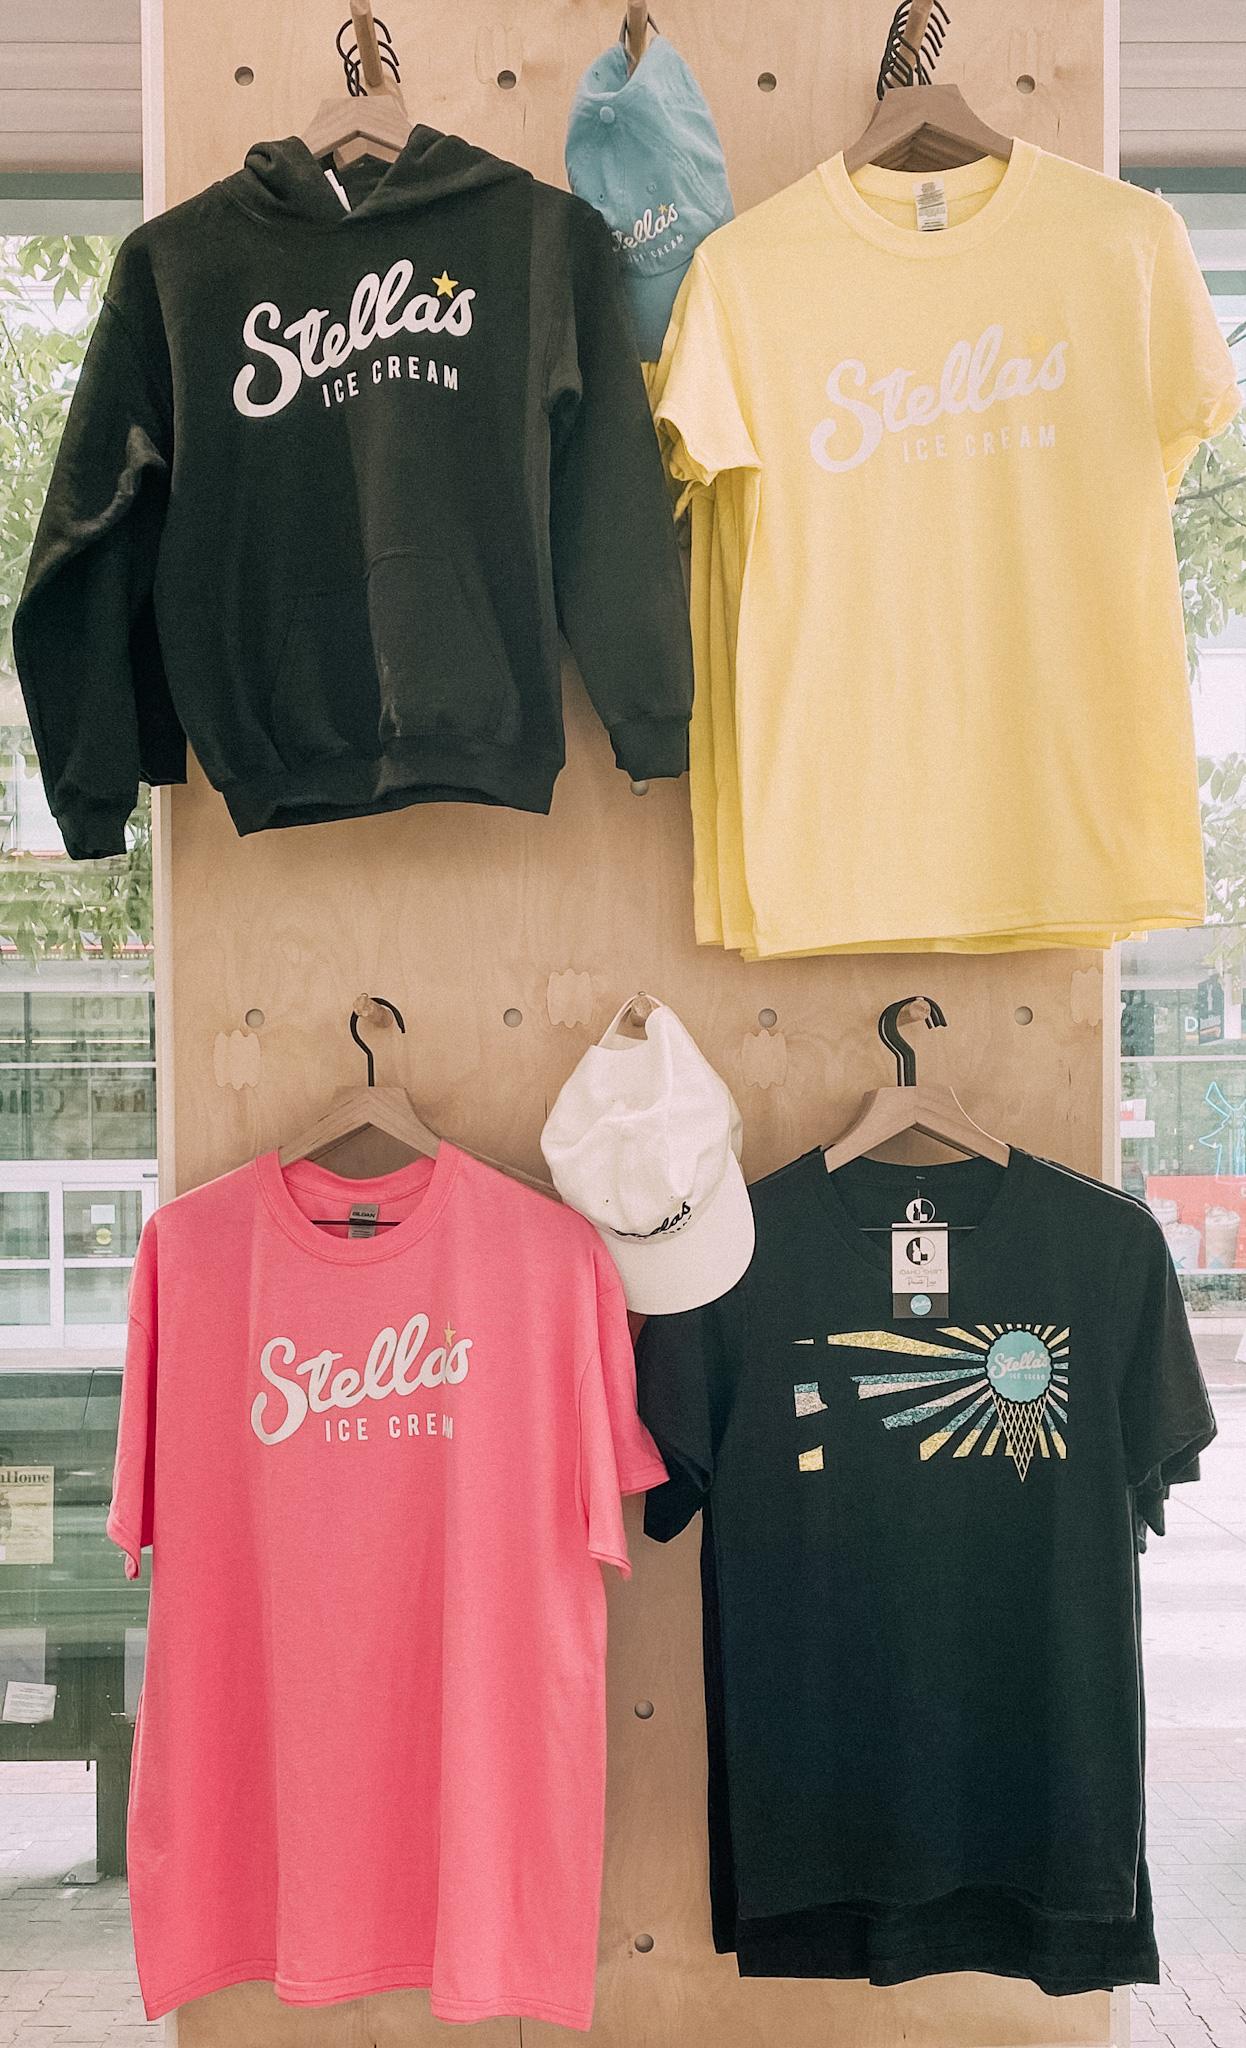 Boise Shirts